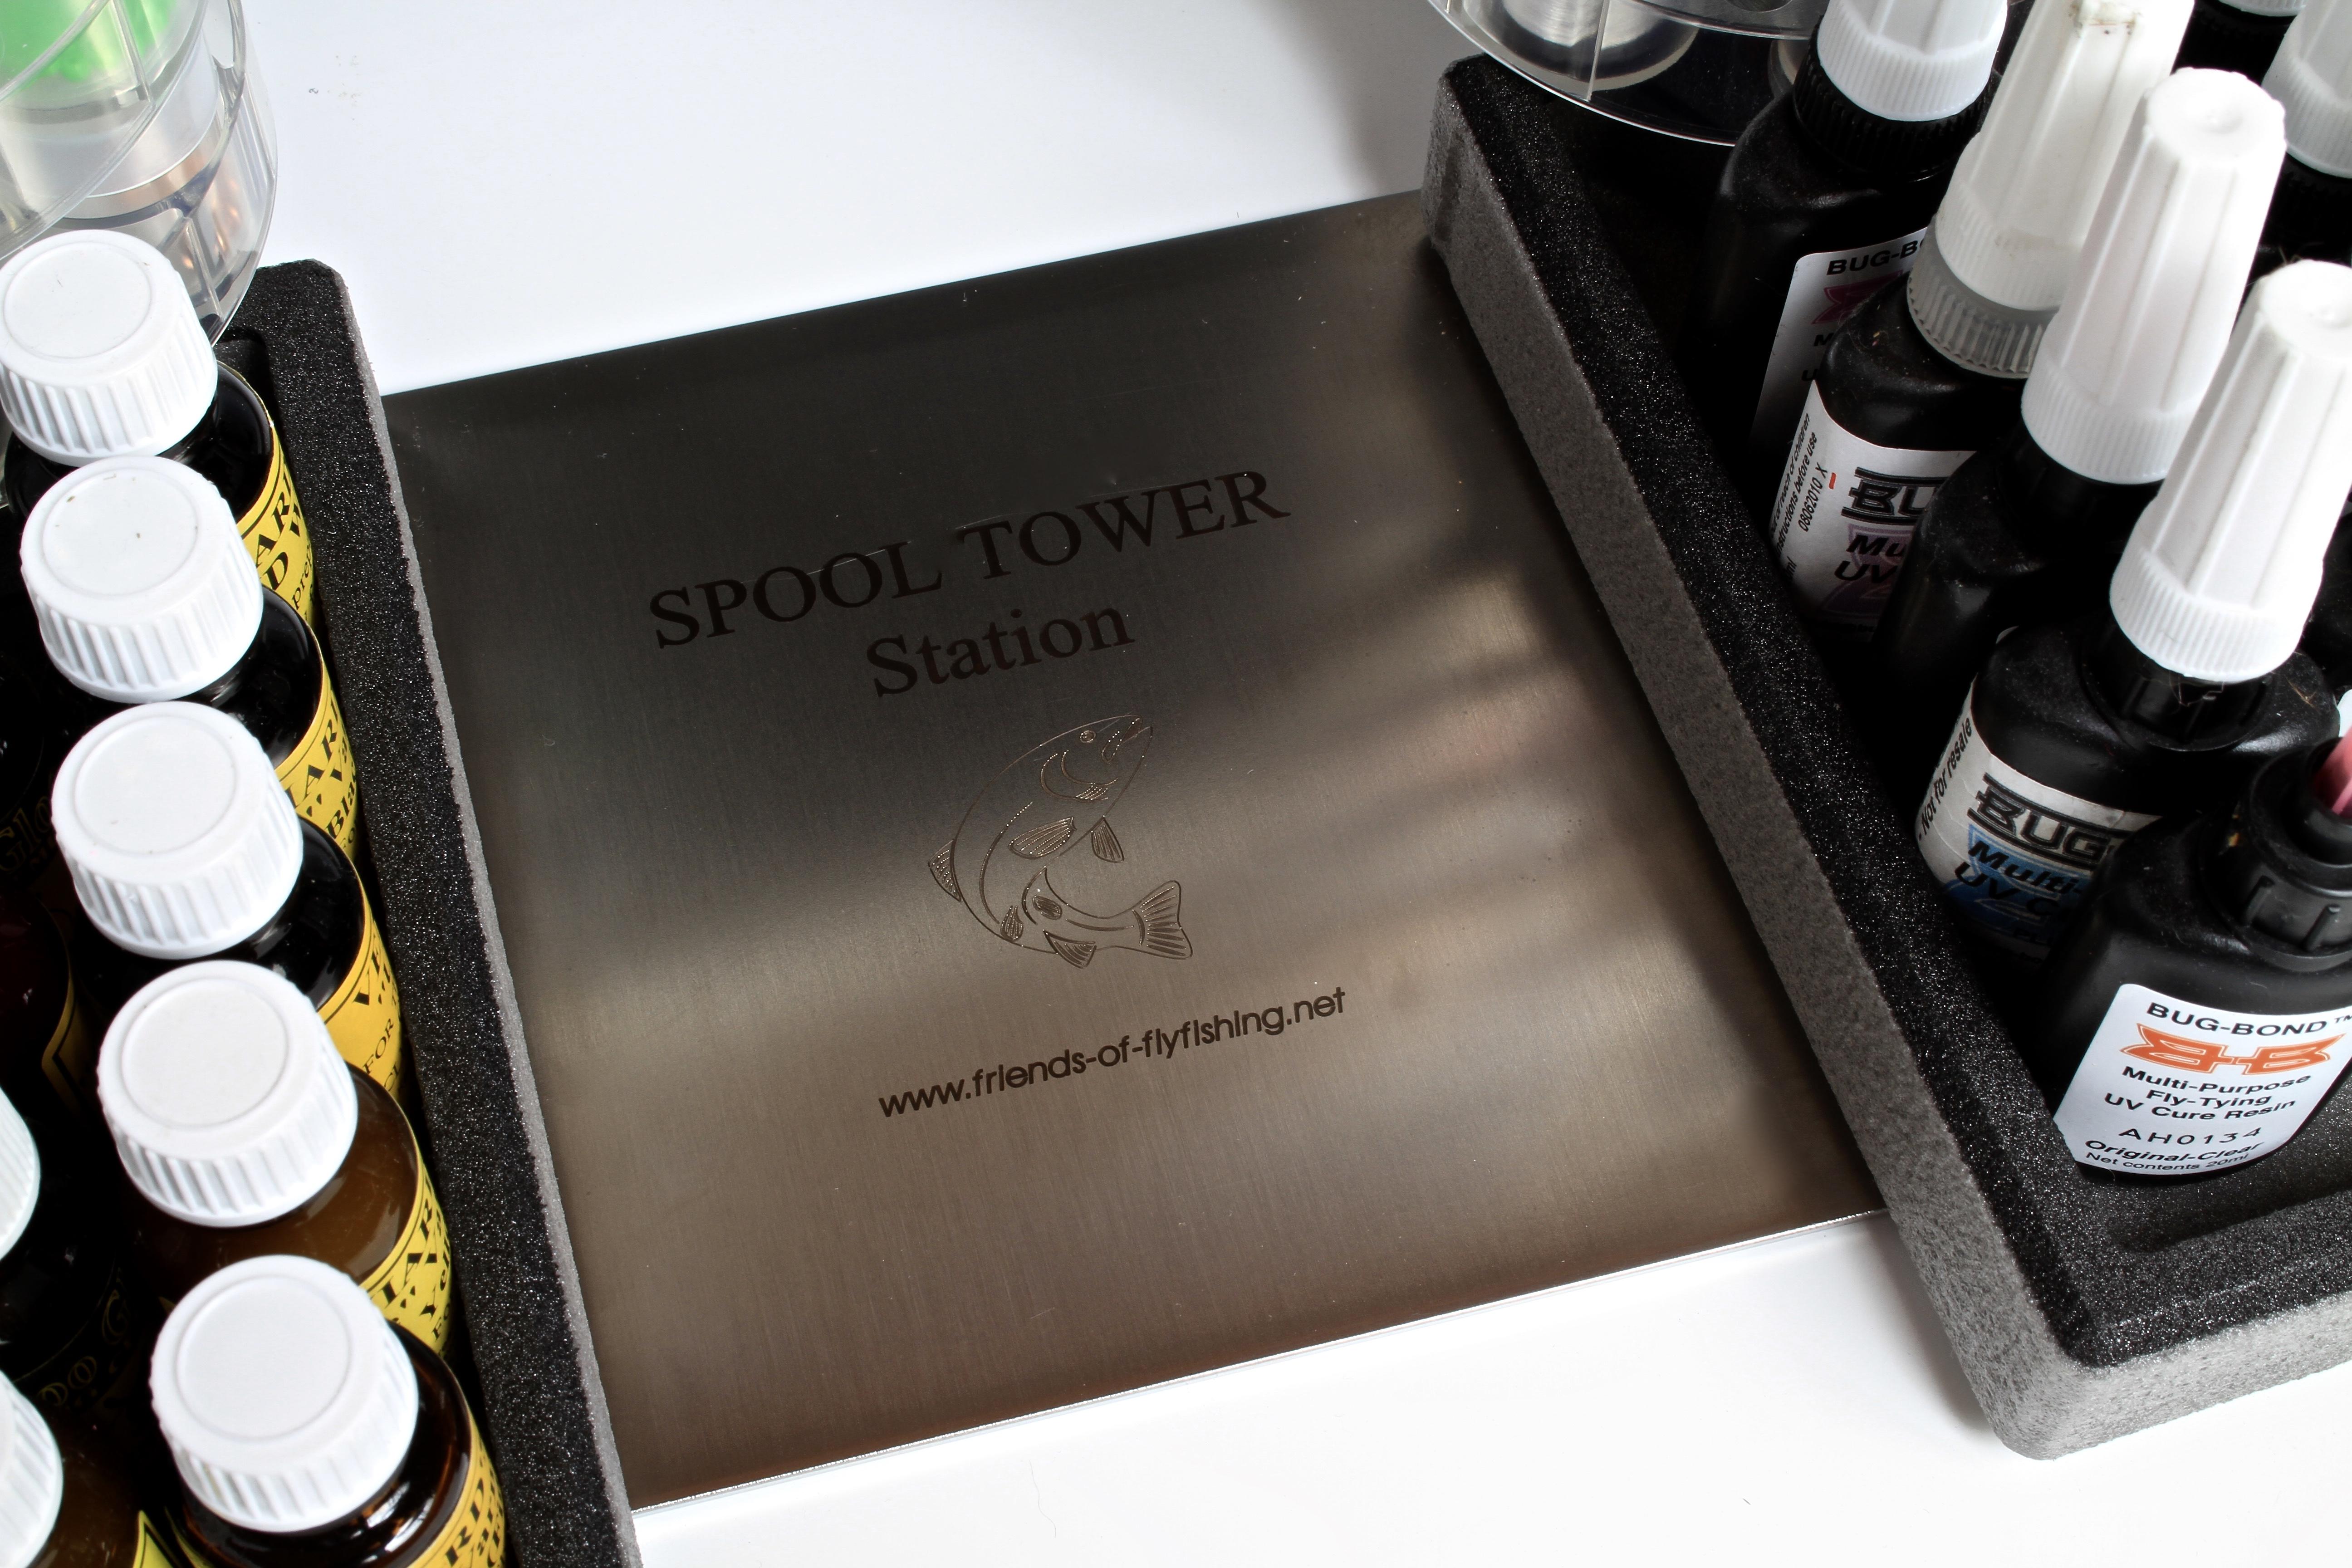 The Spool Tower BOC